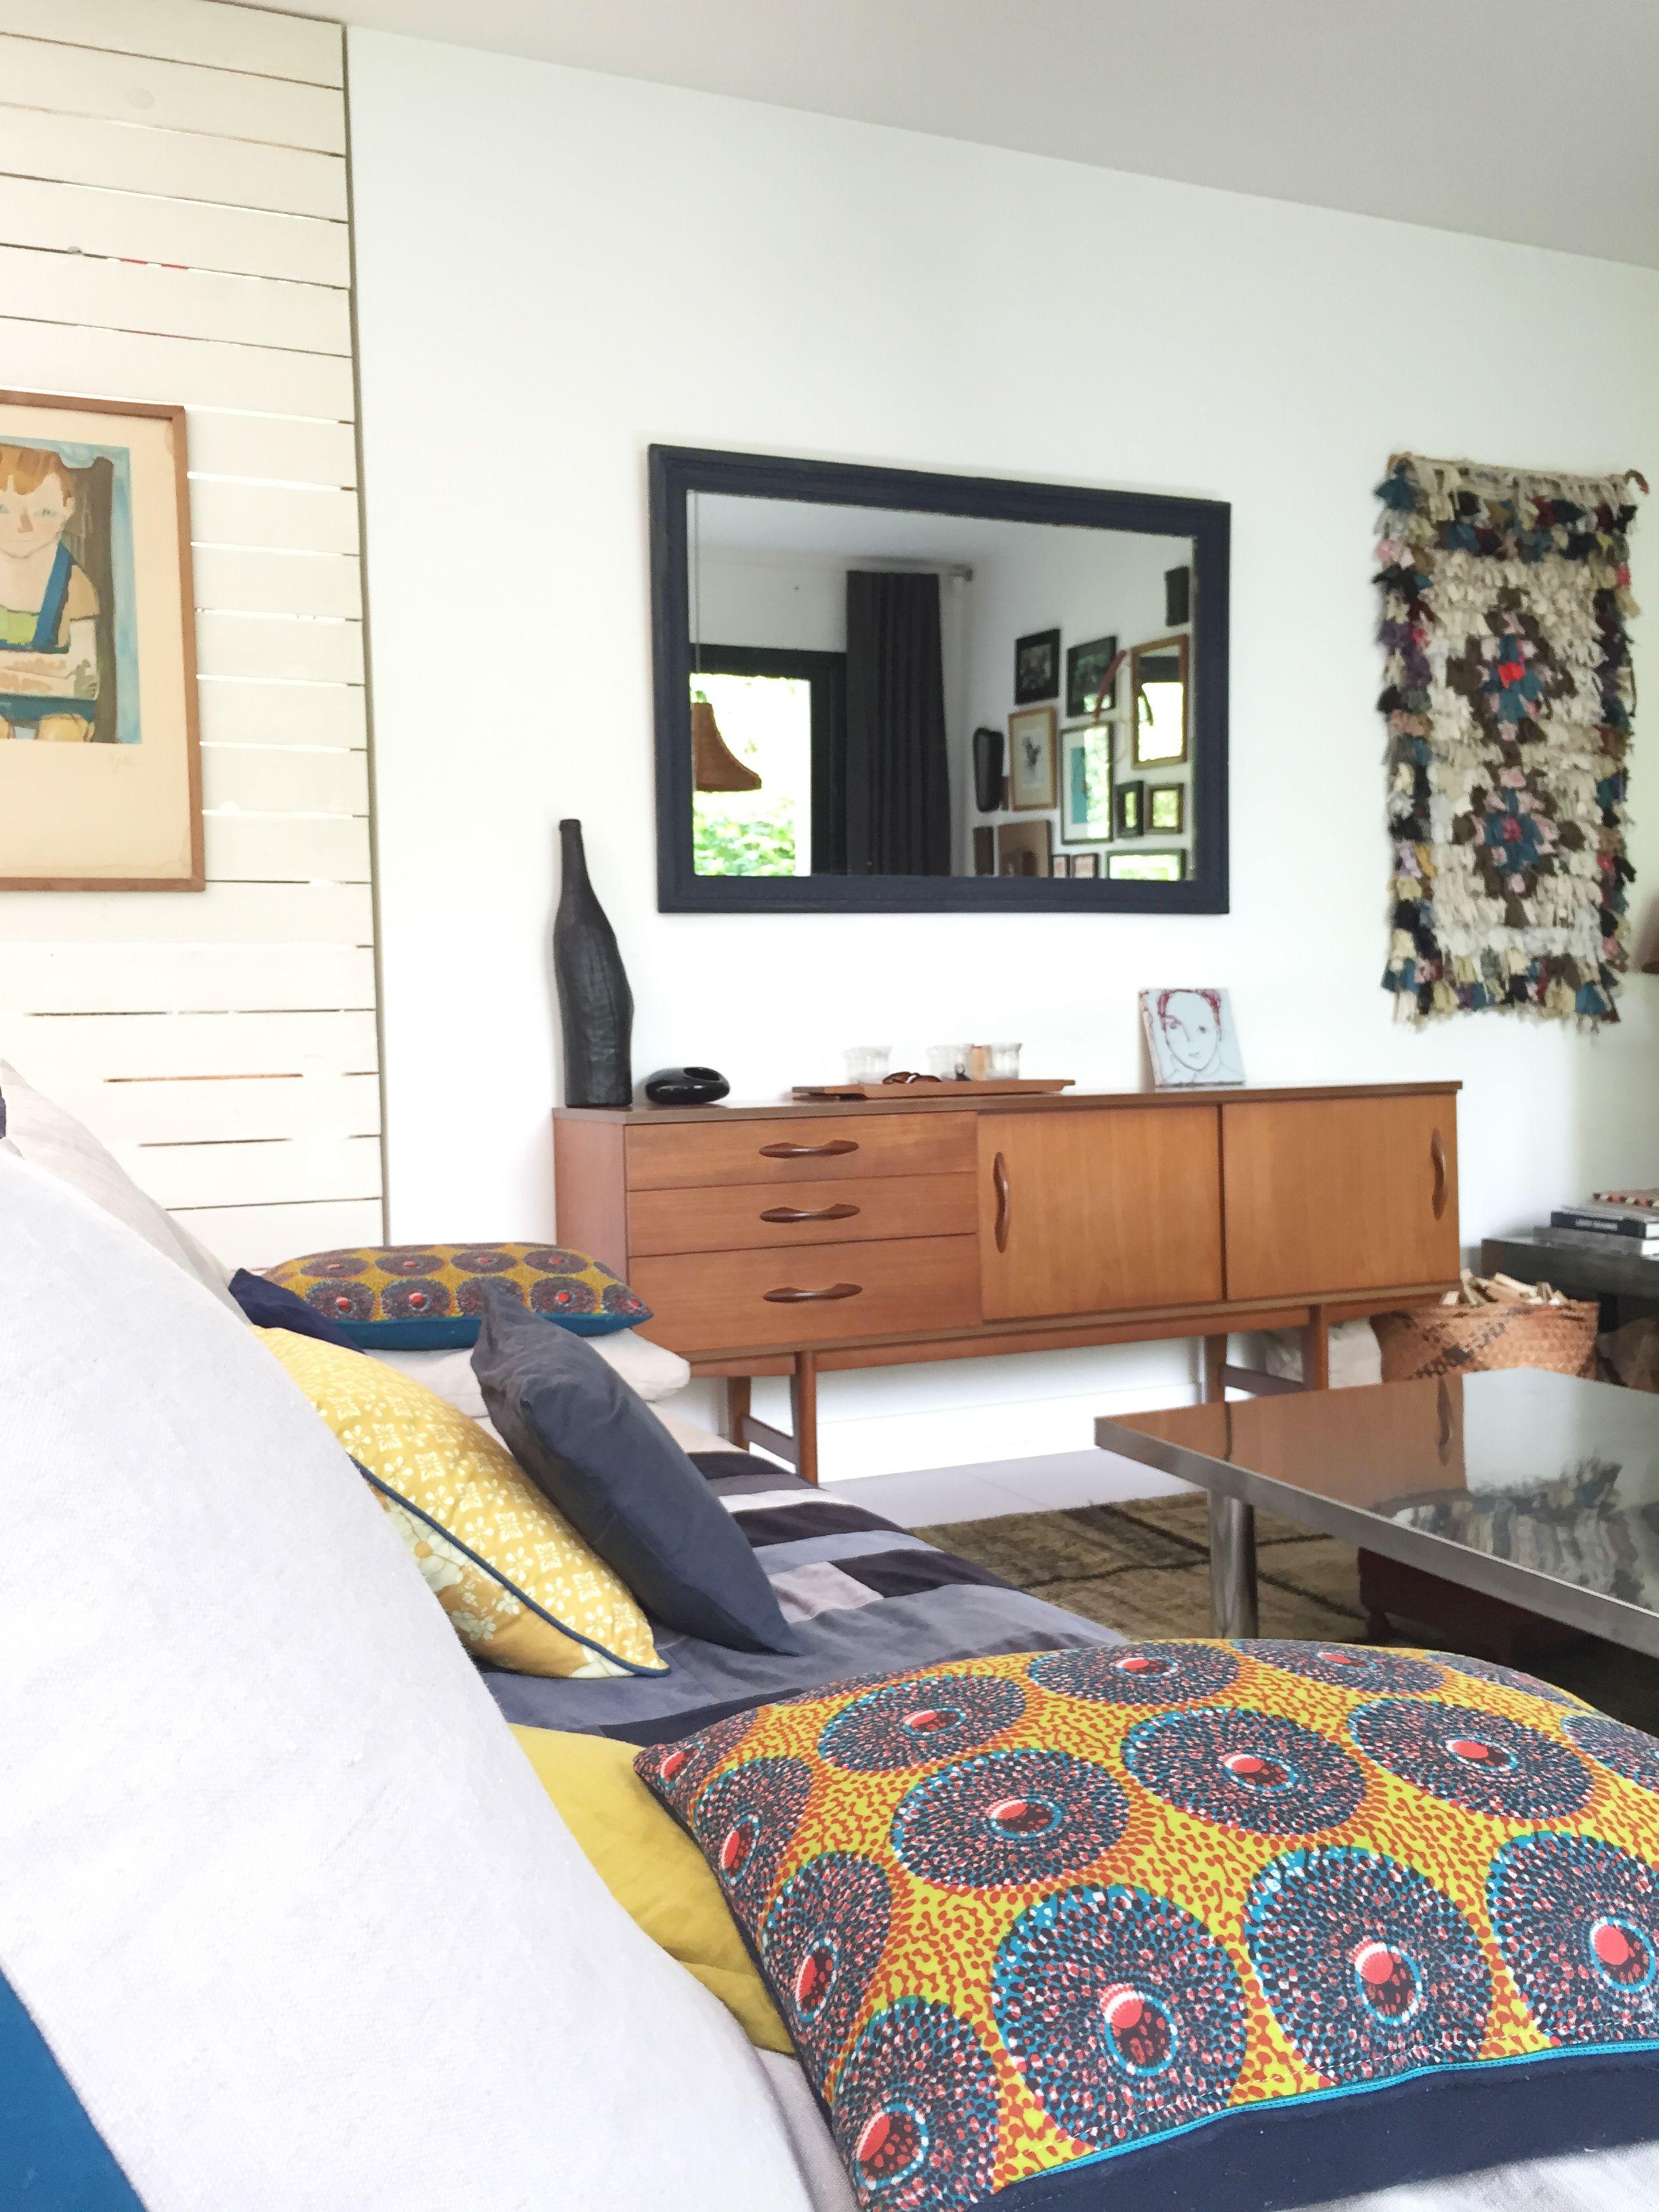 Brocante En Ligne Selency living room / scandinave sideboard / colored cushion / black